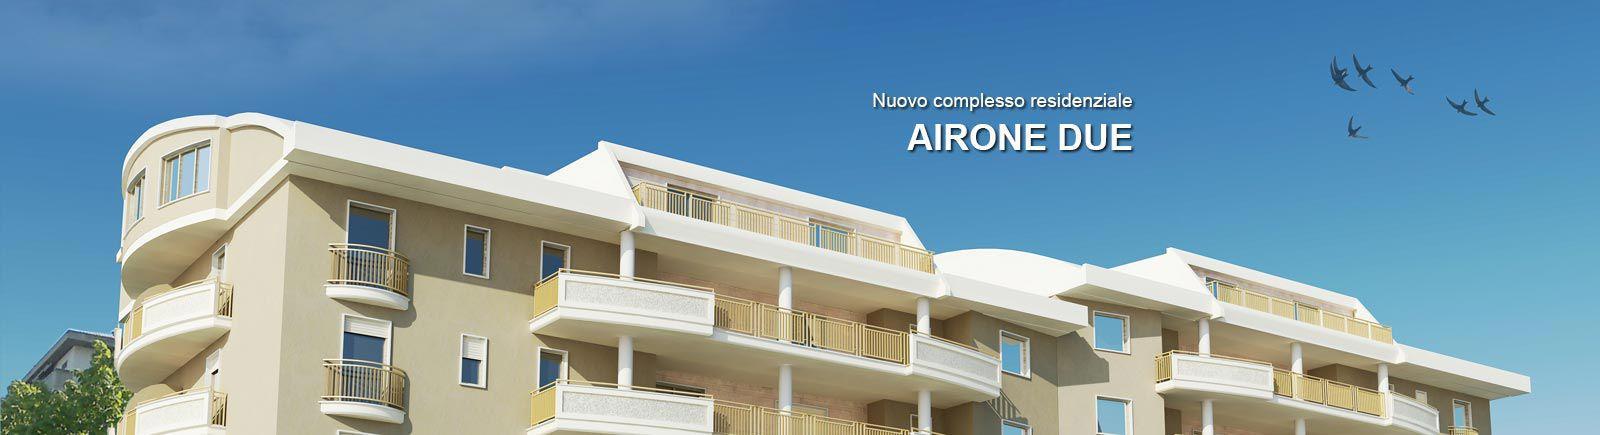 Nuovo complesso residenziale AIRONE DUE c